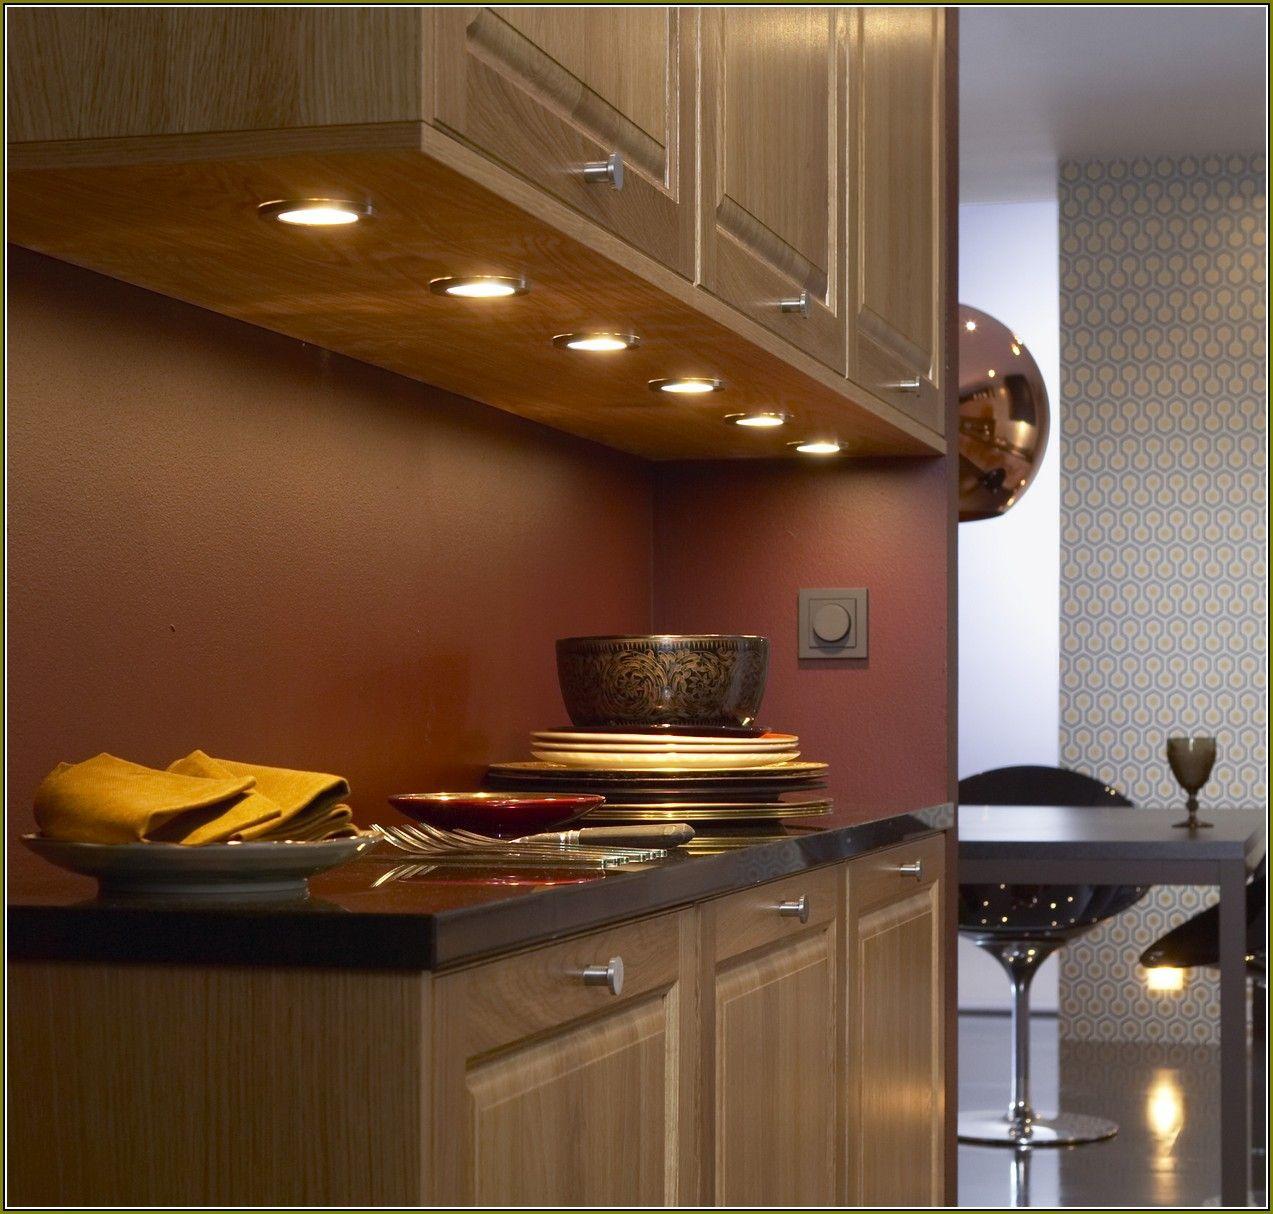 under kitchen cabinet lighting options remodel estimate small ideas glamorous stylish modern wooden